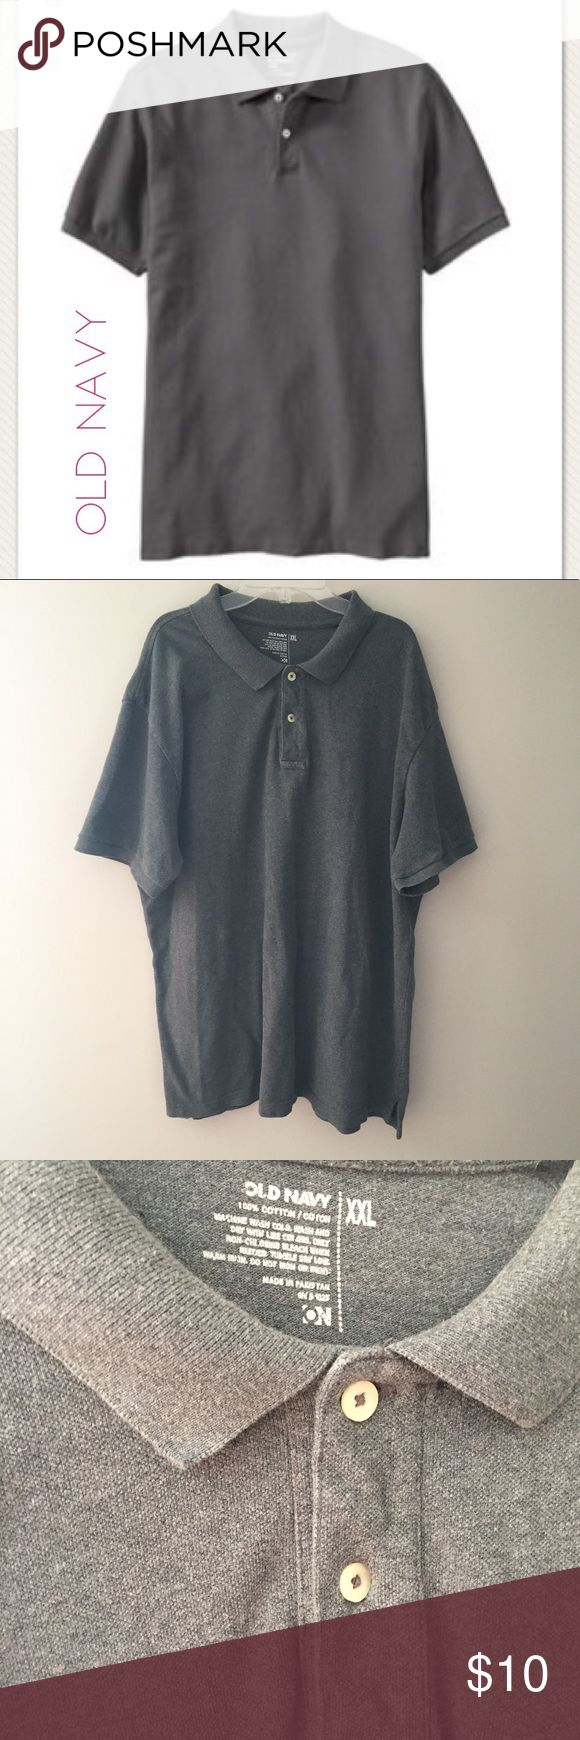 "Old Navy men's grey polo shirt. Size XXL Old Navy men's grey polo shirt. Size XXL. Cotton. 29"" long Old Navy Shirts Polos"